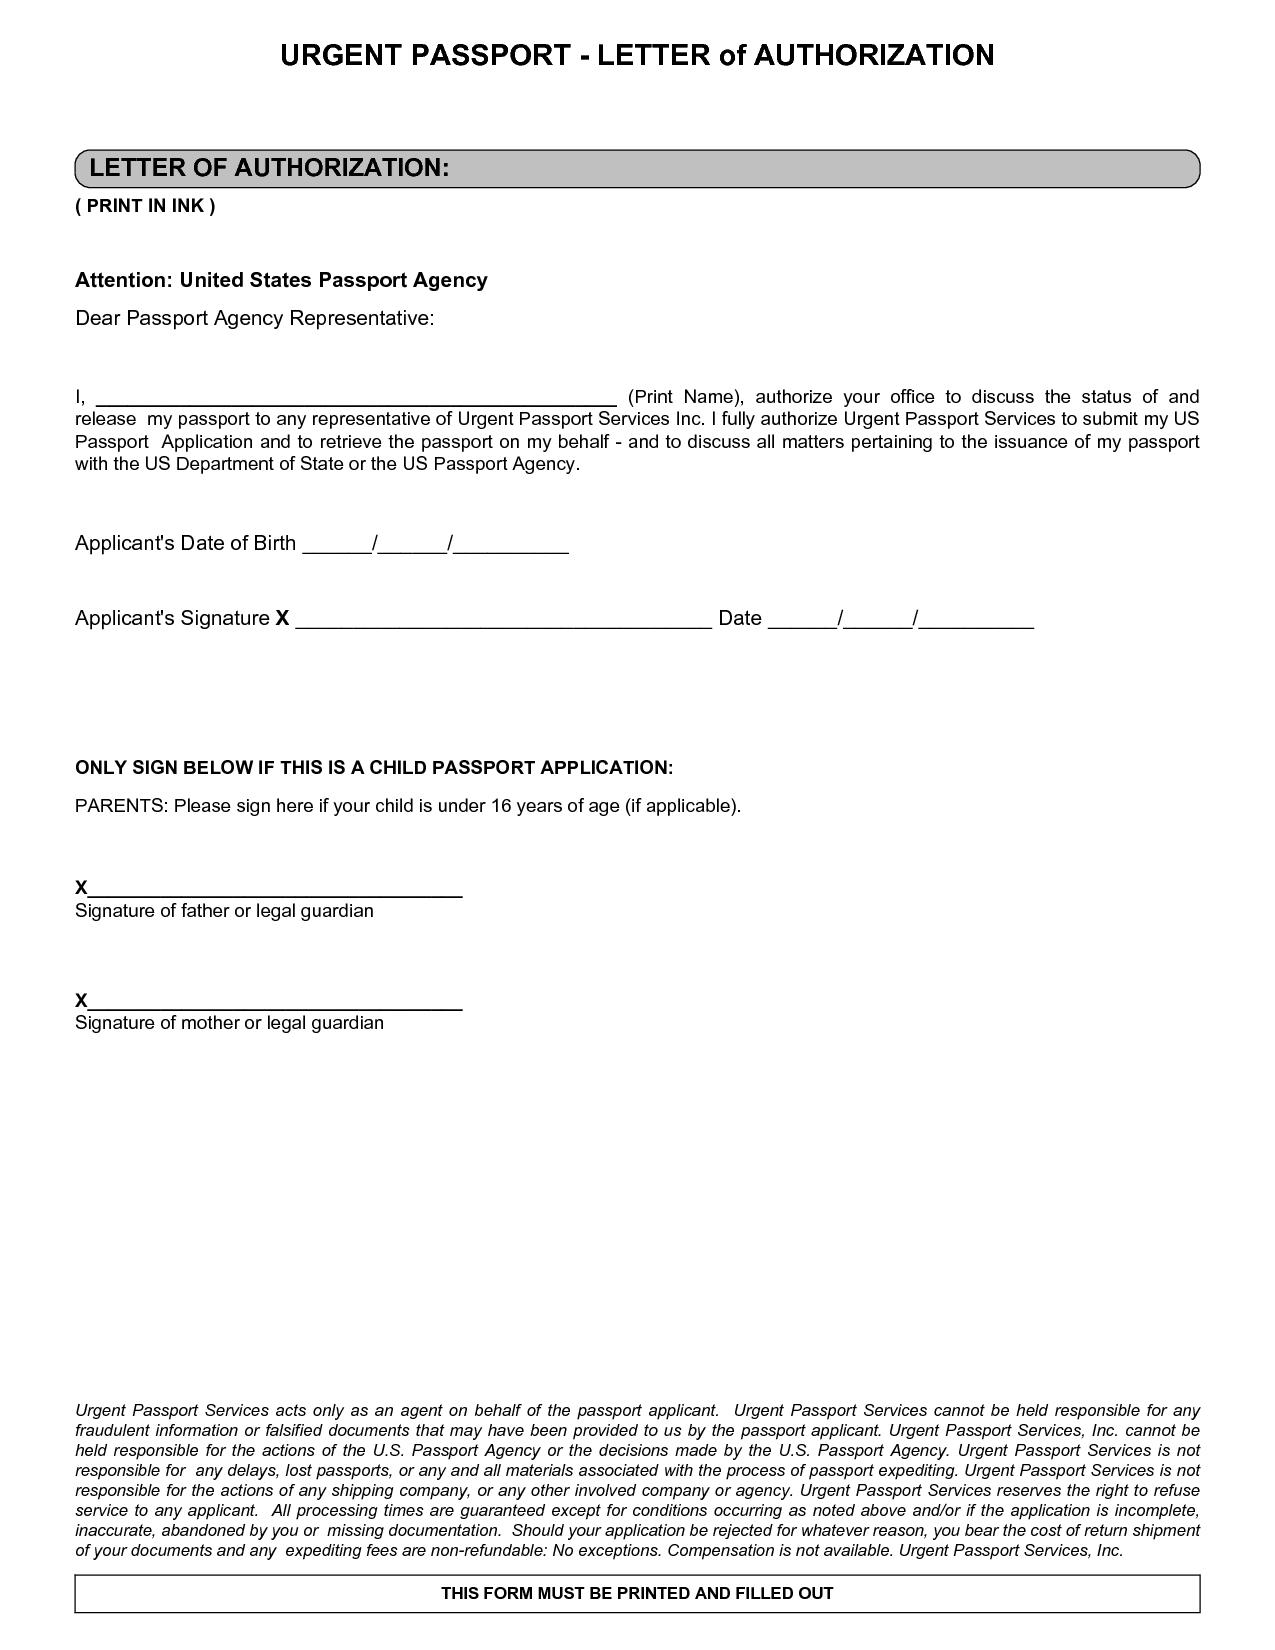 application for child passport nz